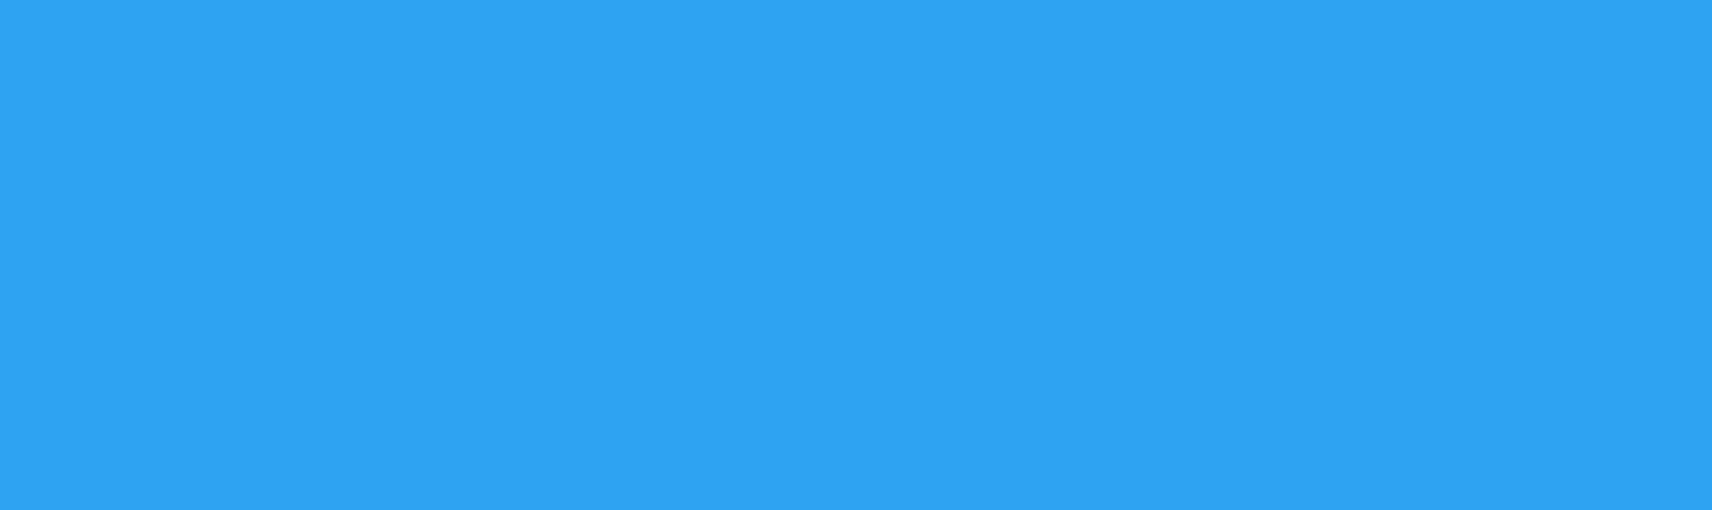 rowe MedienManufaktur GmbH & Co. KG